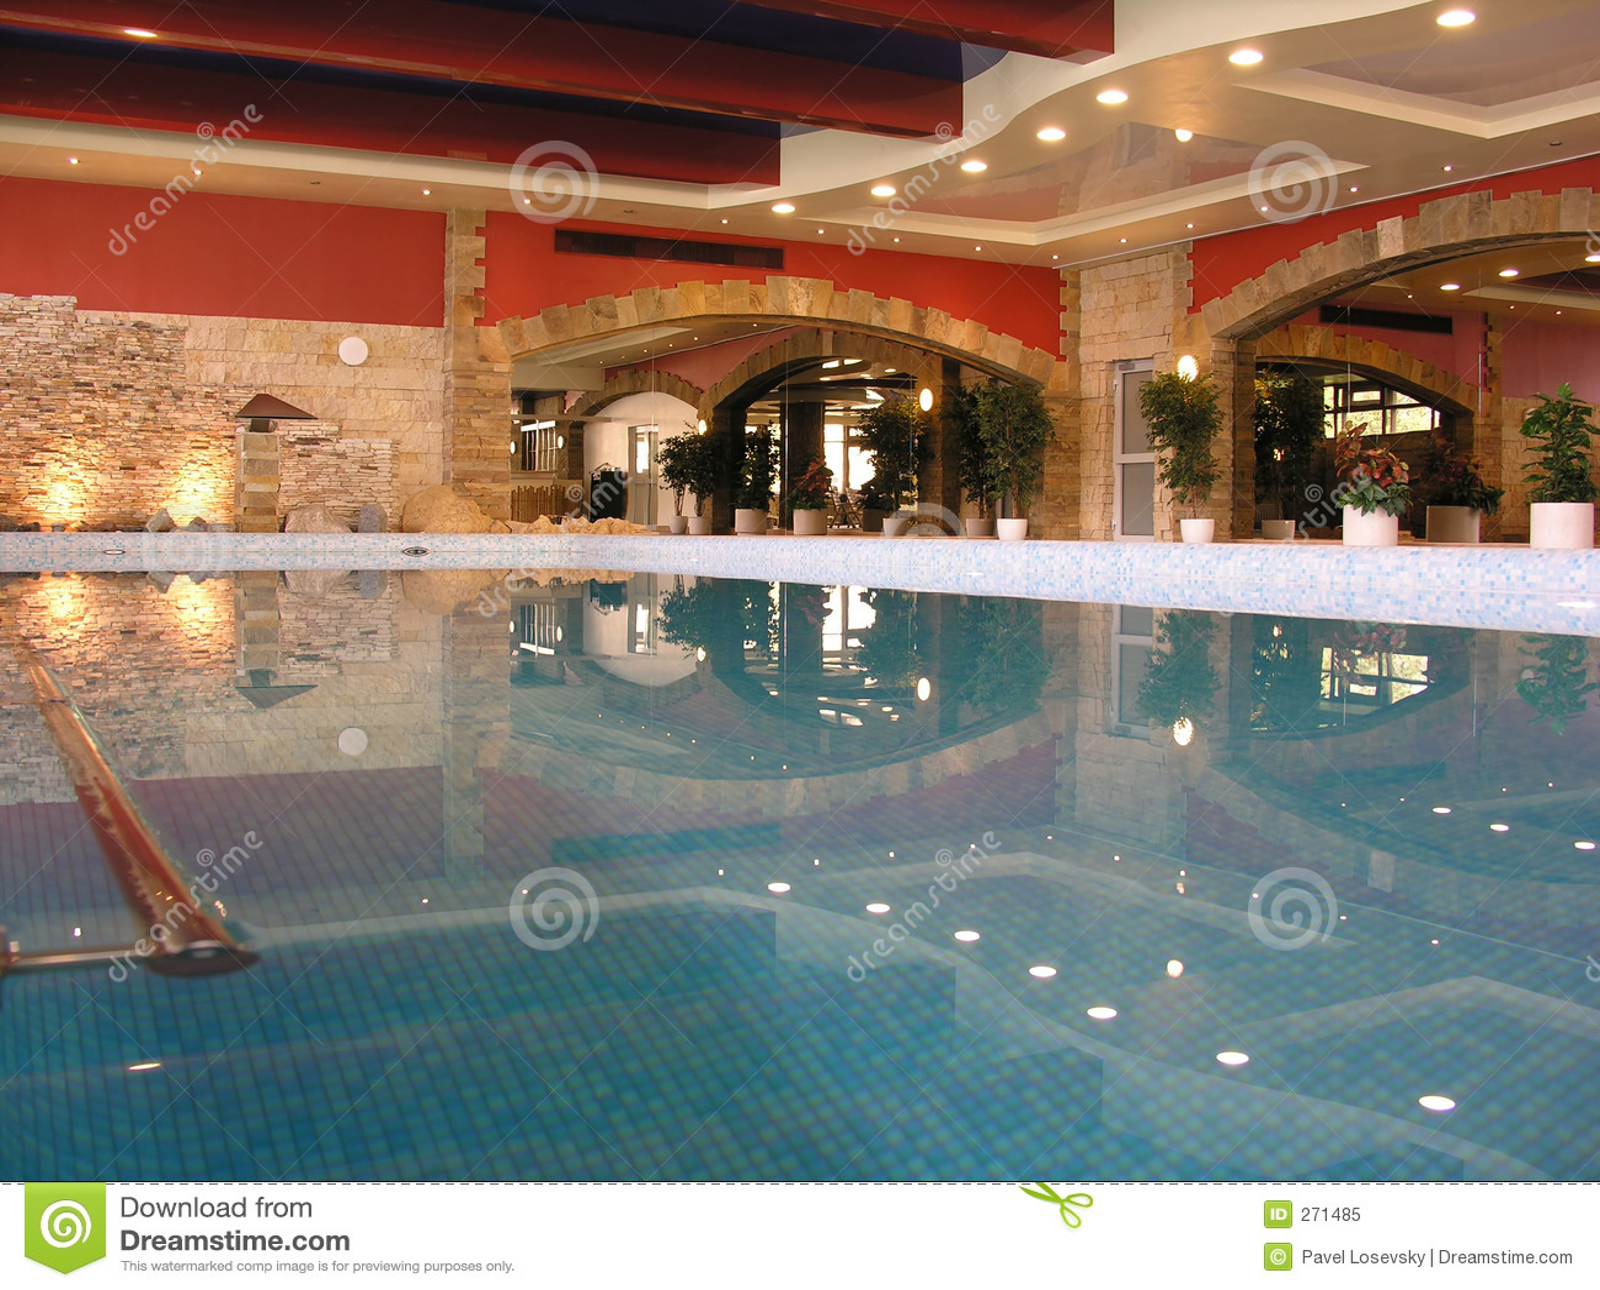 Swimming pool in health club